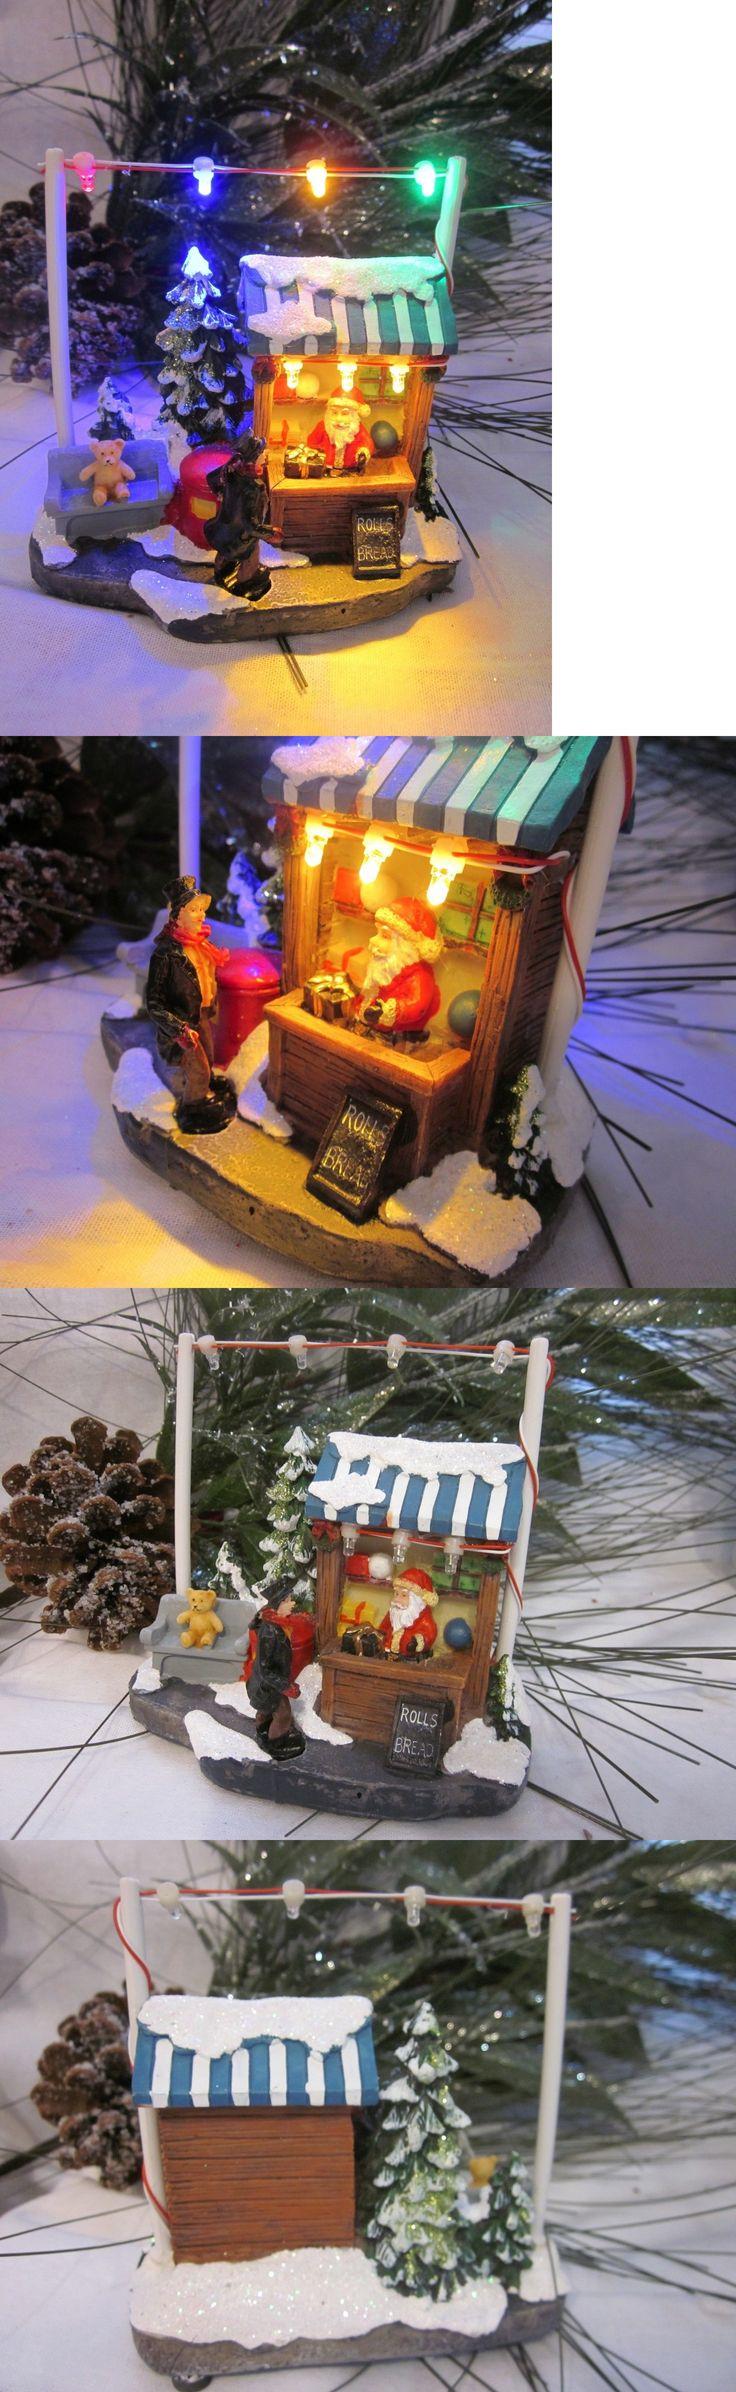 Flying santa fibre optic christmas decoration - Snow Globes 156890 Led Light Up Santa Bread Shop Figure Village Christmas Decor Statue